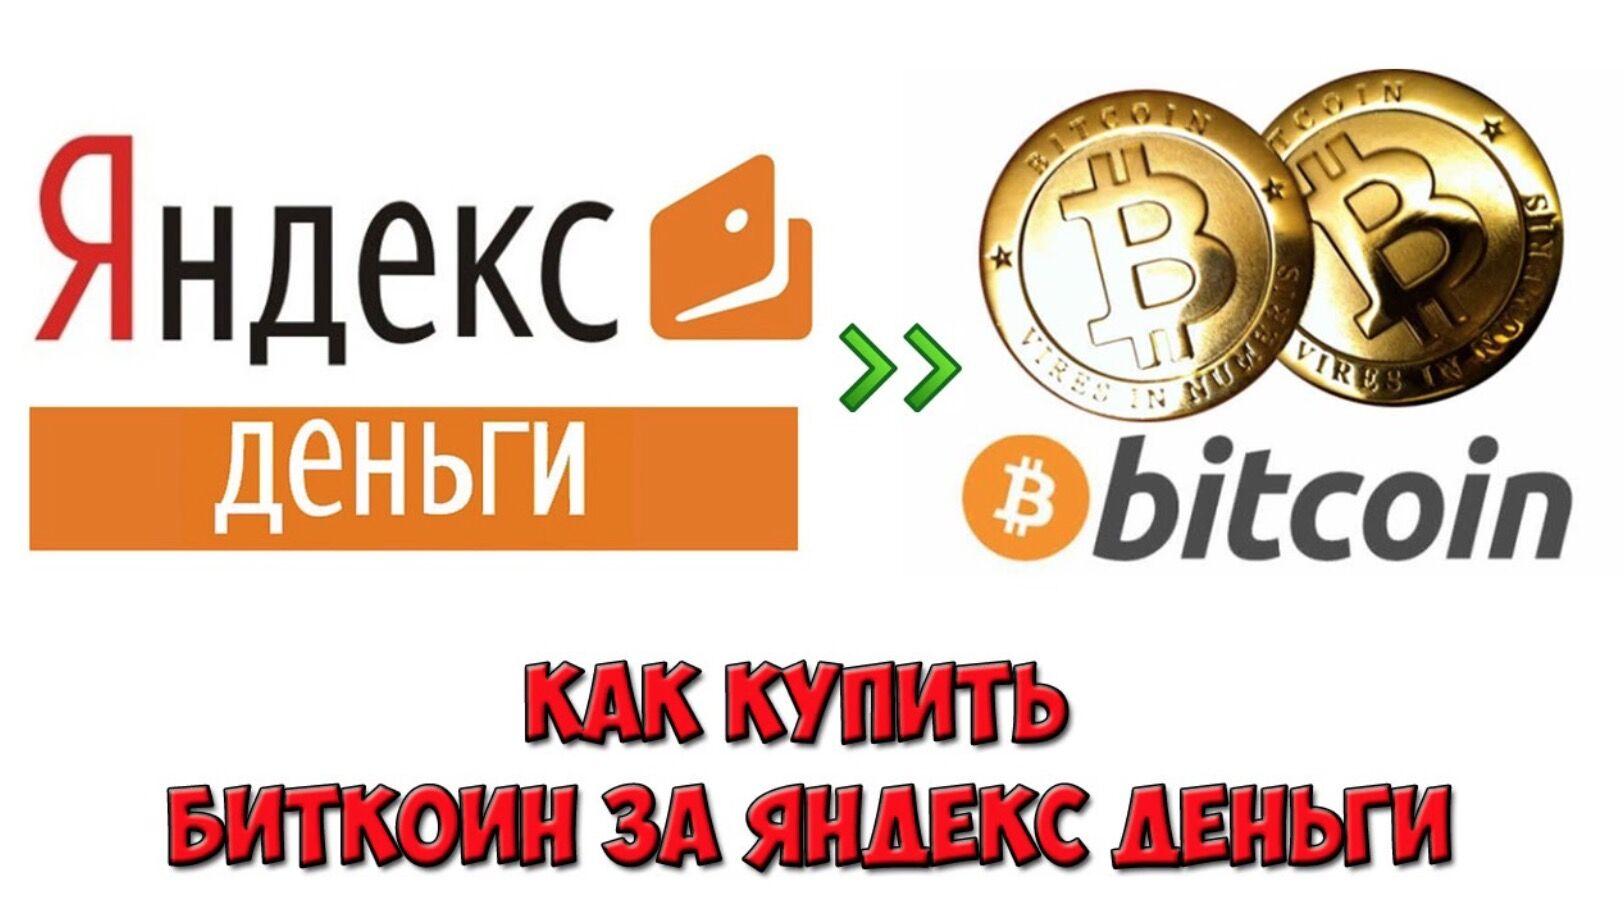 Яндекс деньги для биткоинов форекс банка